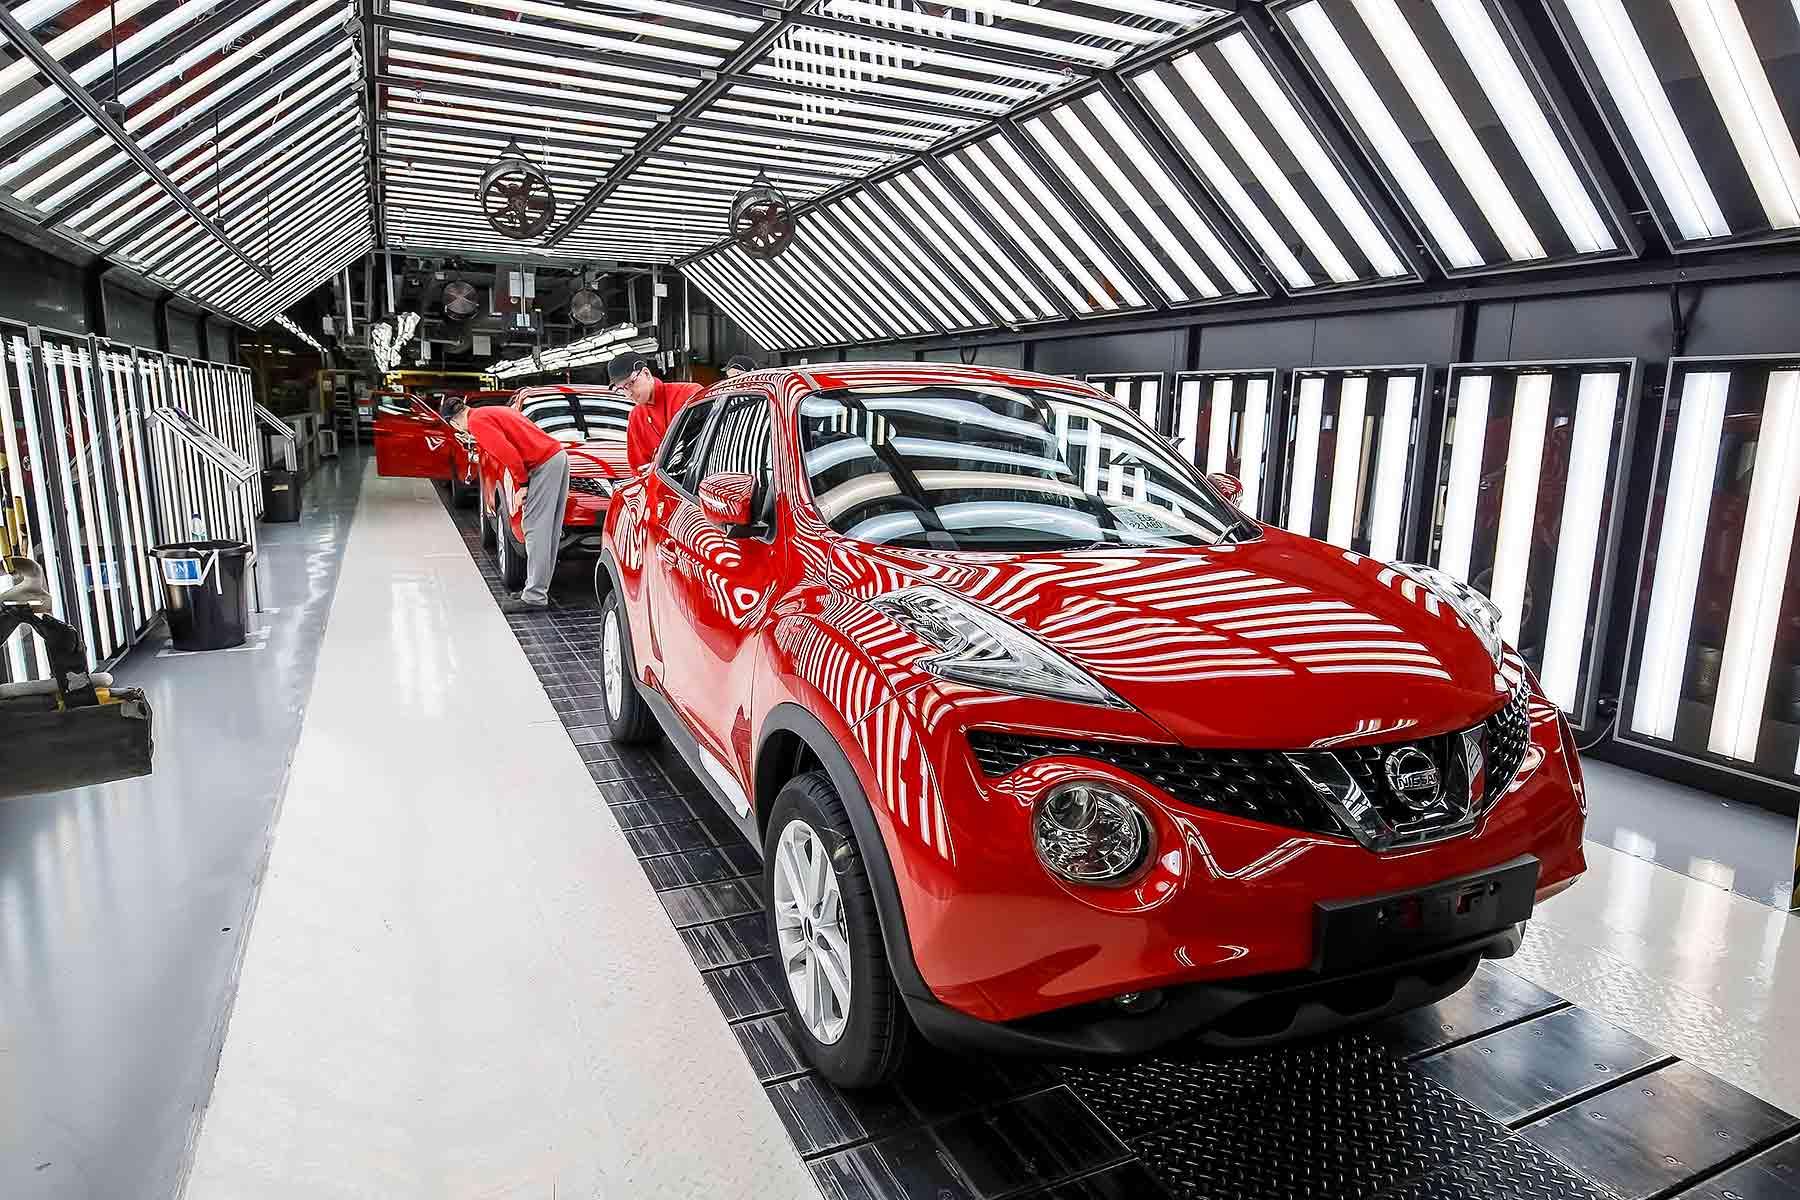 Nissan Juke production in Sunderland